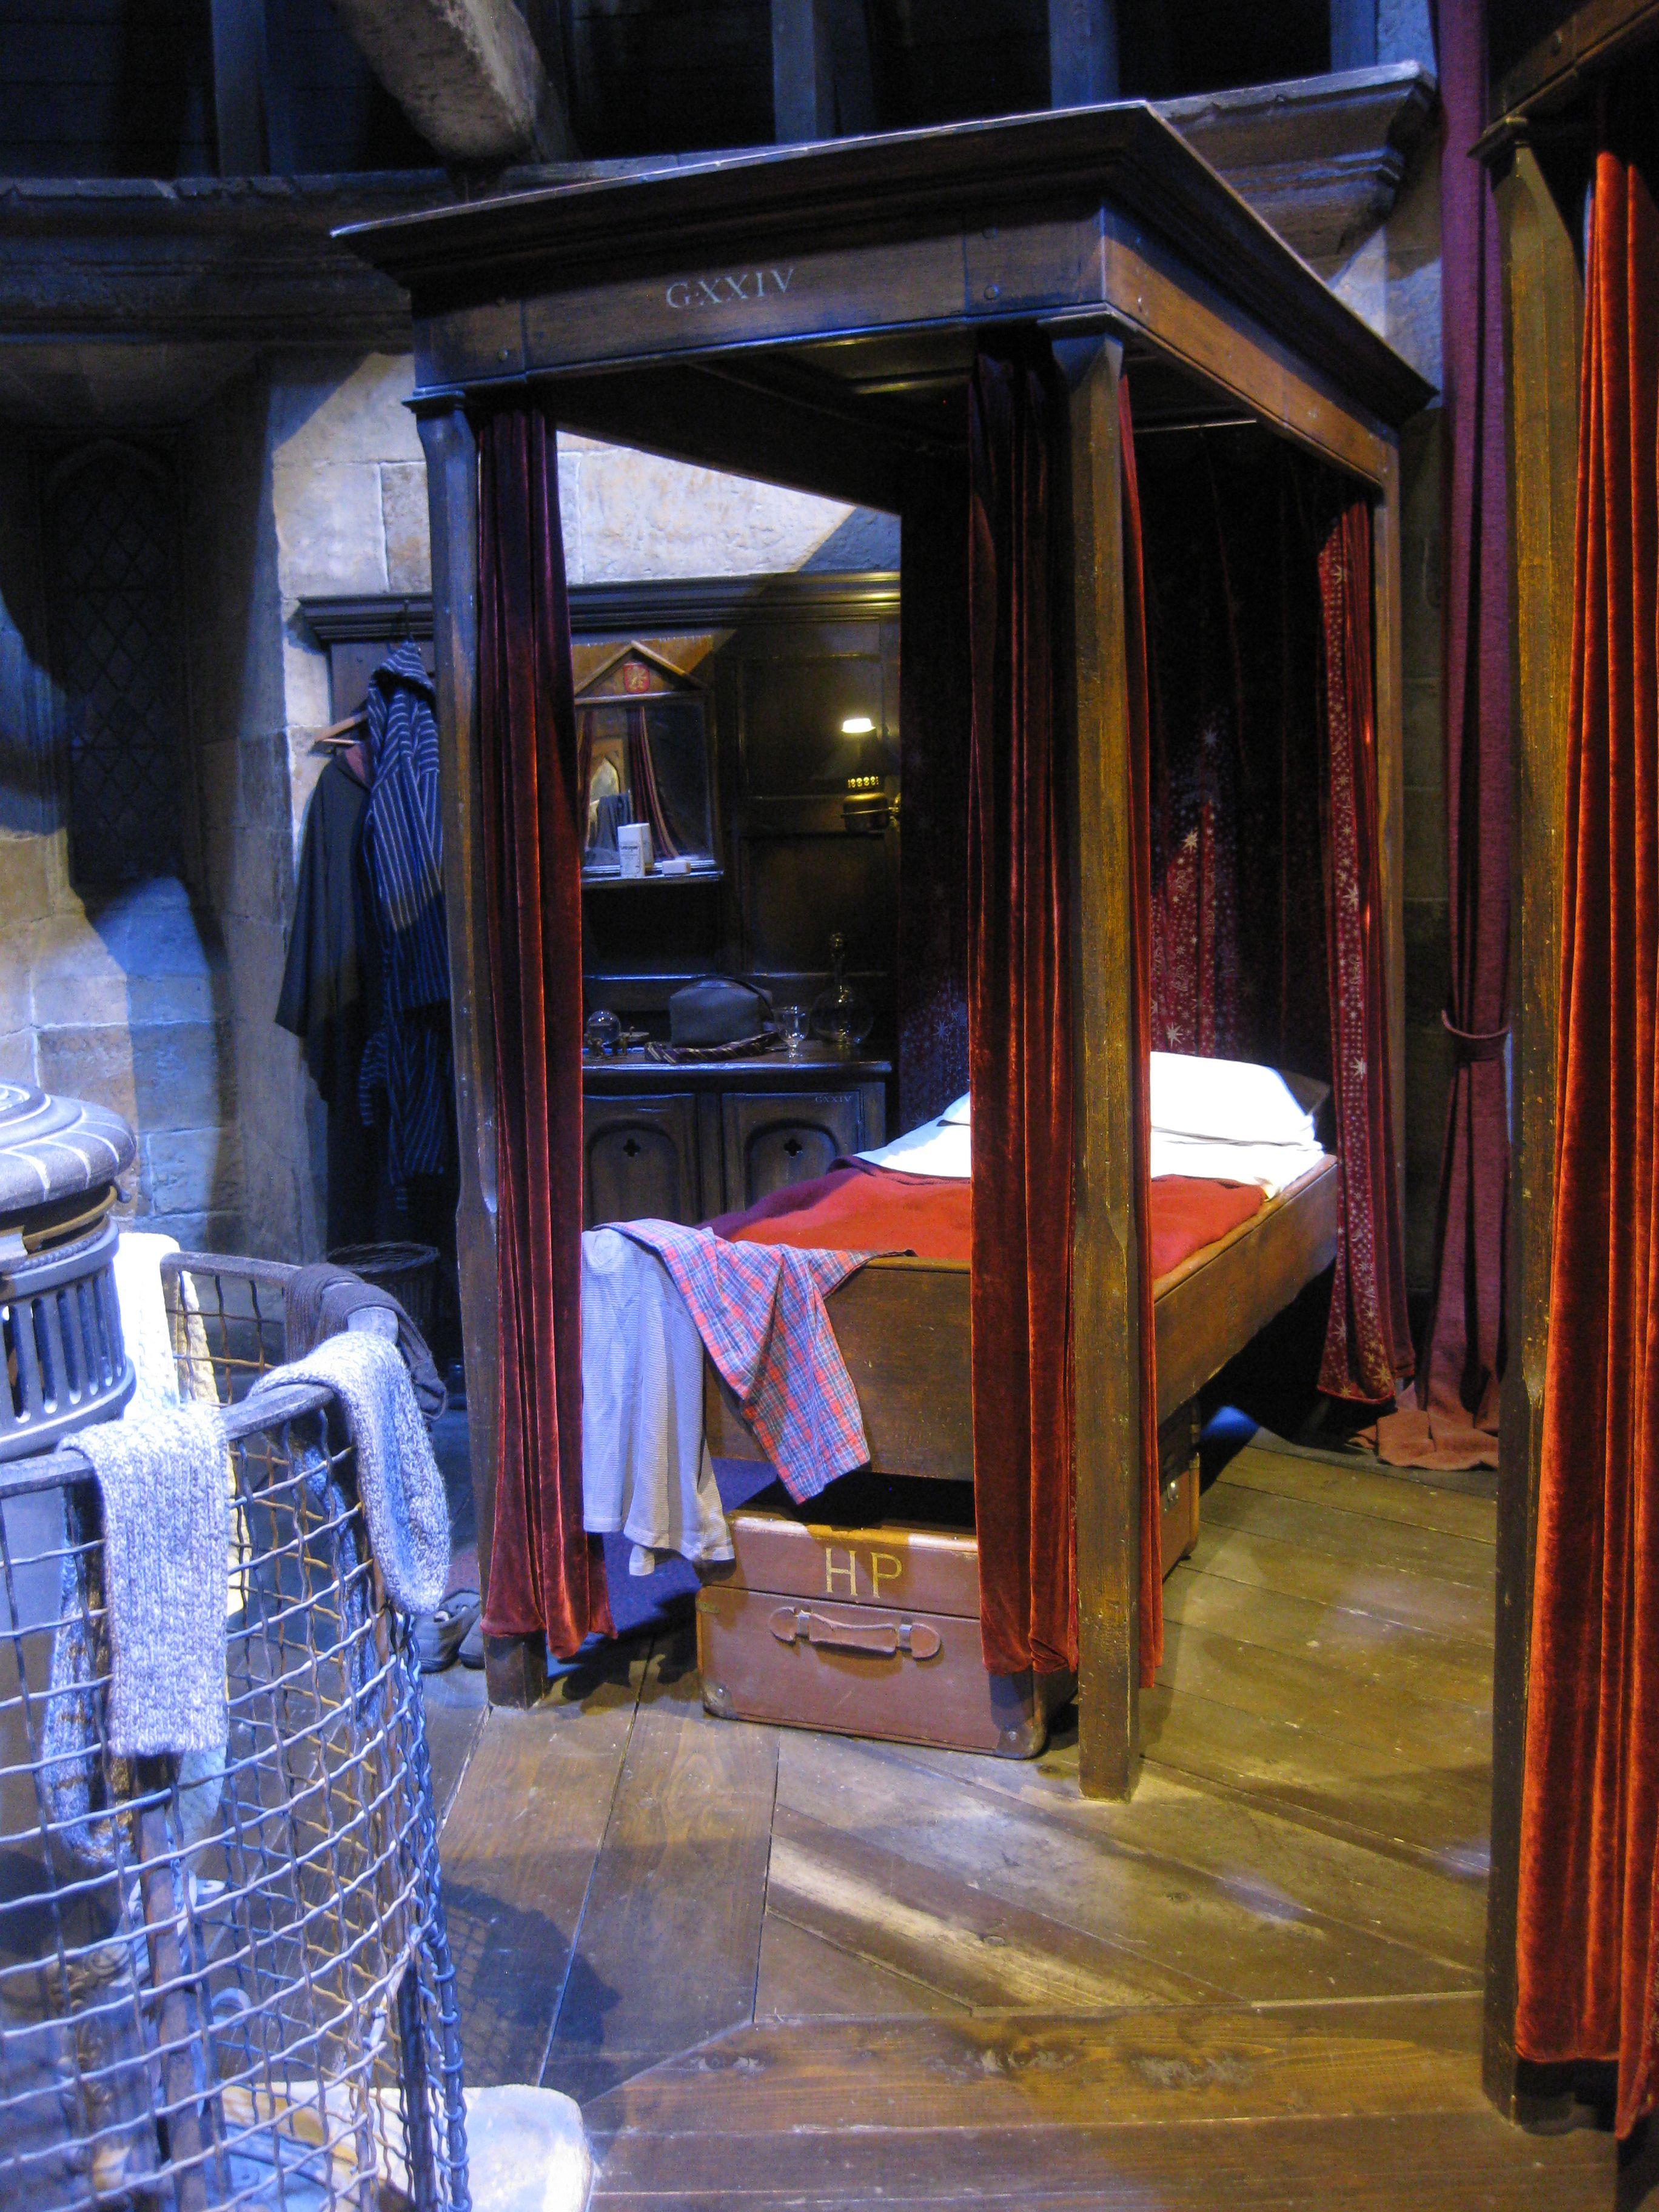 Harry Potter S Bedroom At Hogwarts Movie Tour England Harry